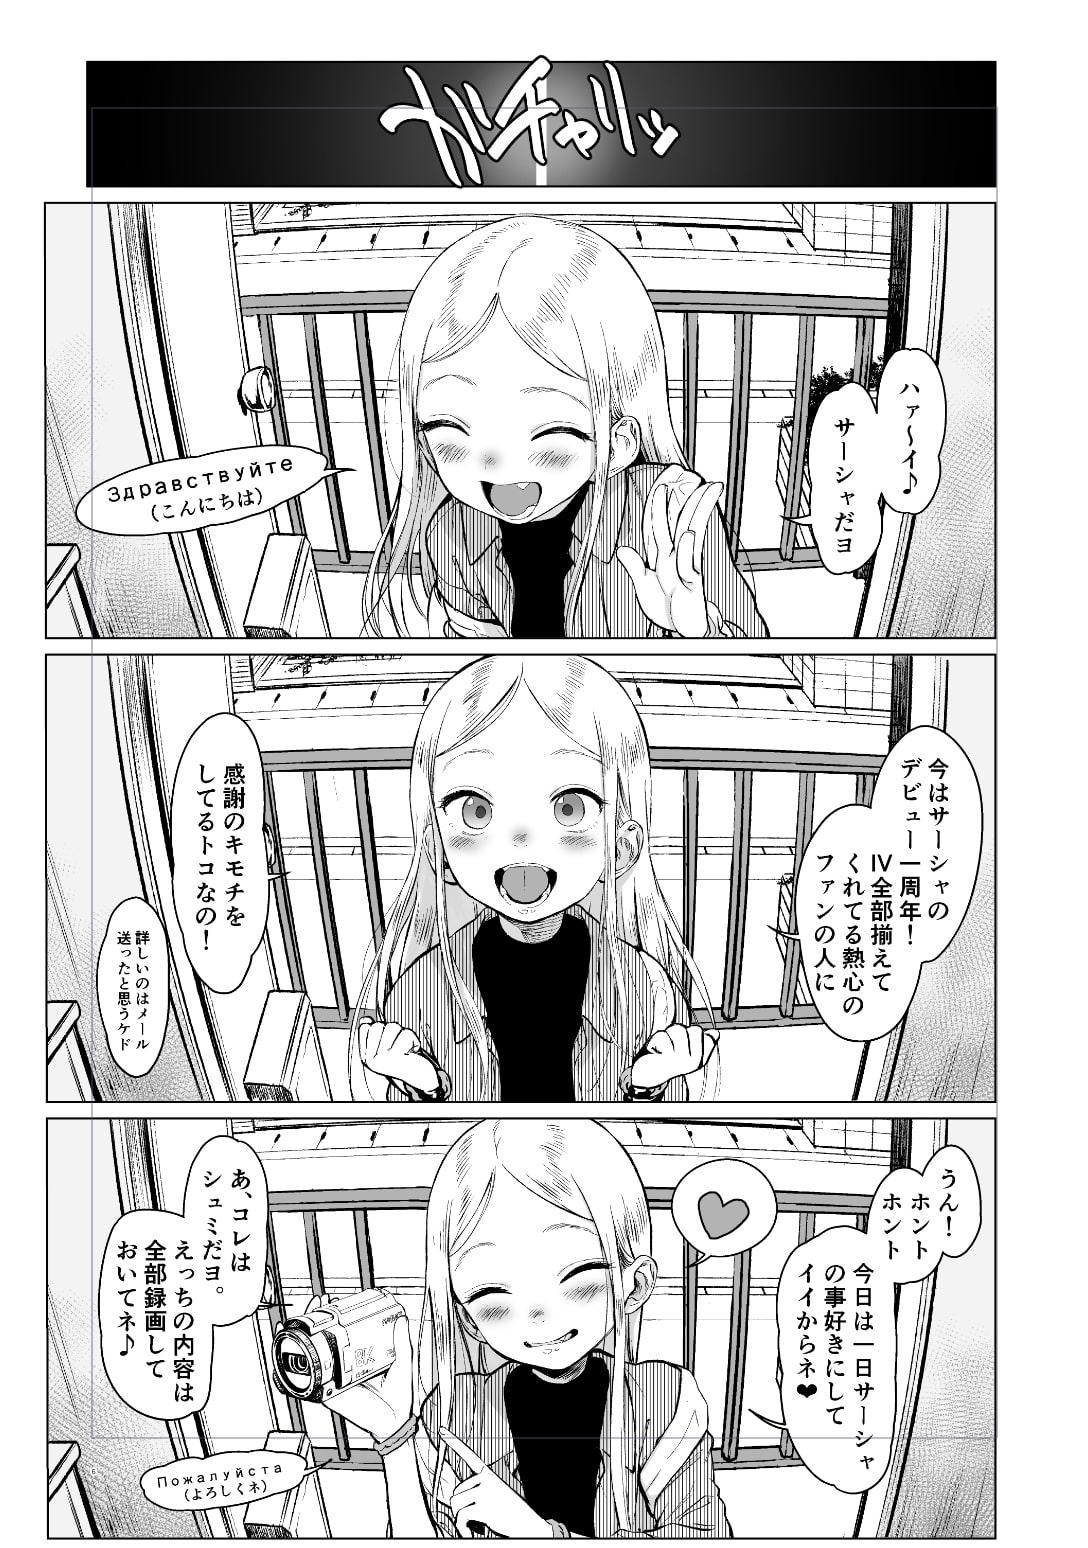 Welcome Sashachang サーシャちゃんがようこそ